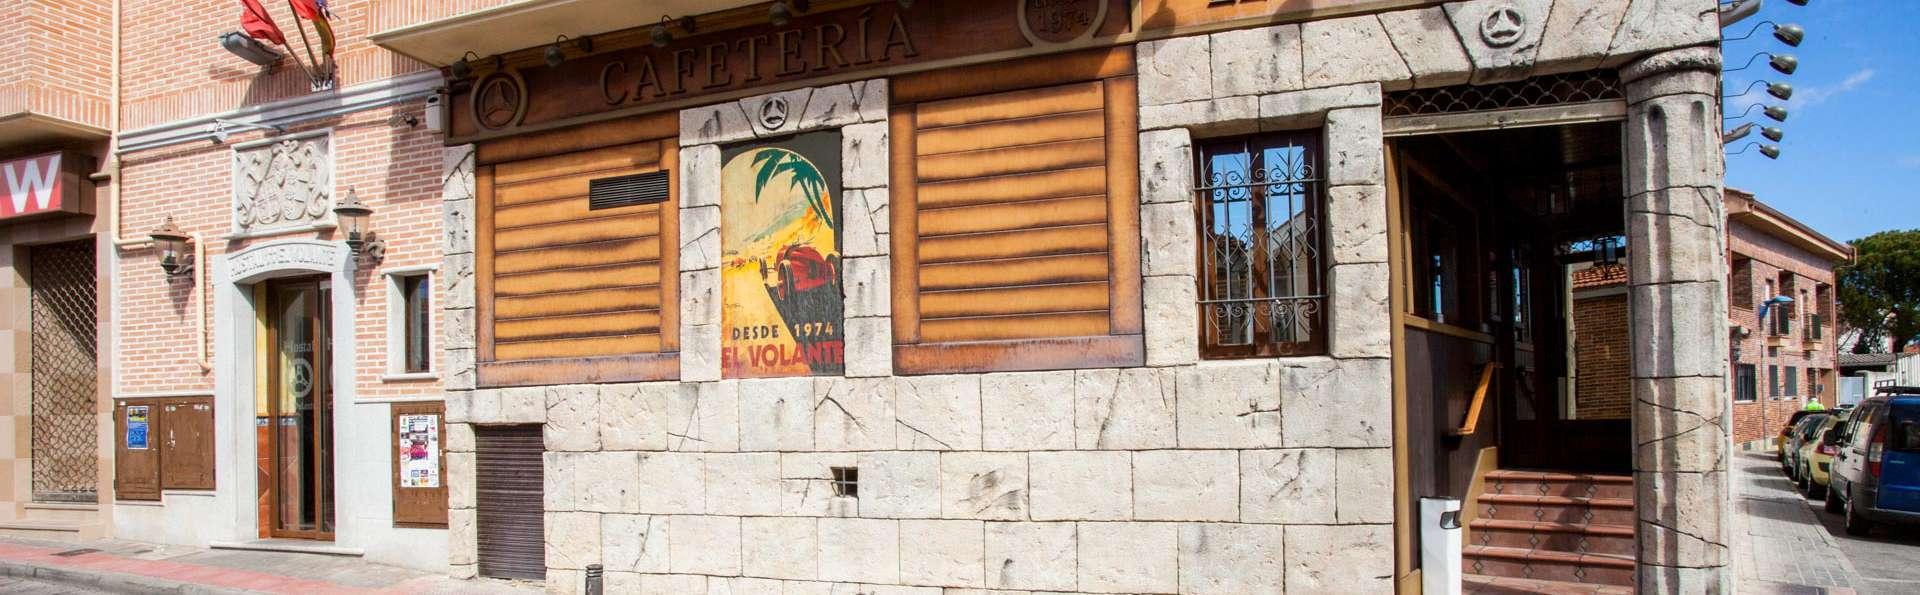 Hostal- Restaurante El Volante - EDIT_FRONT_01.jpg